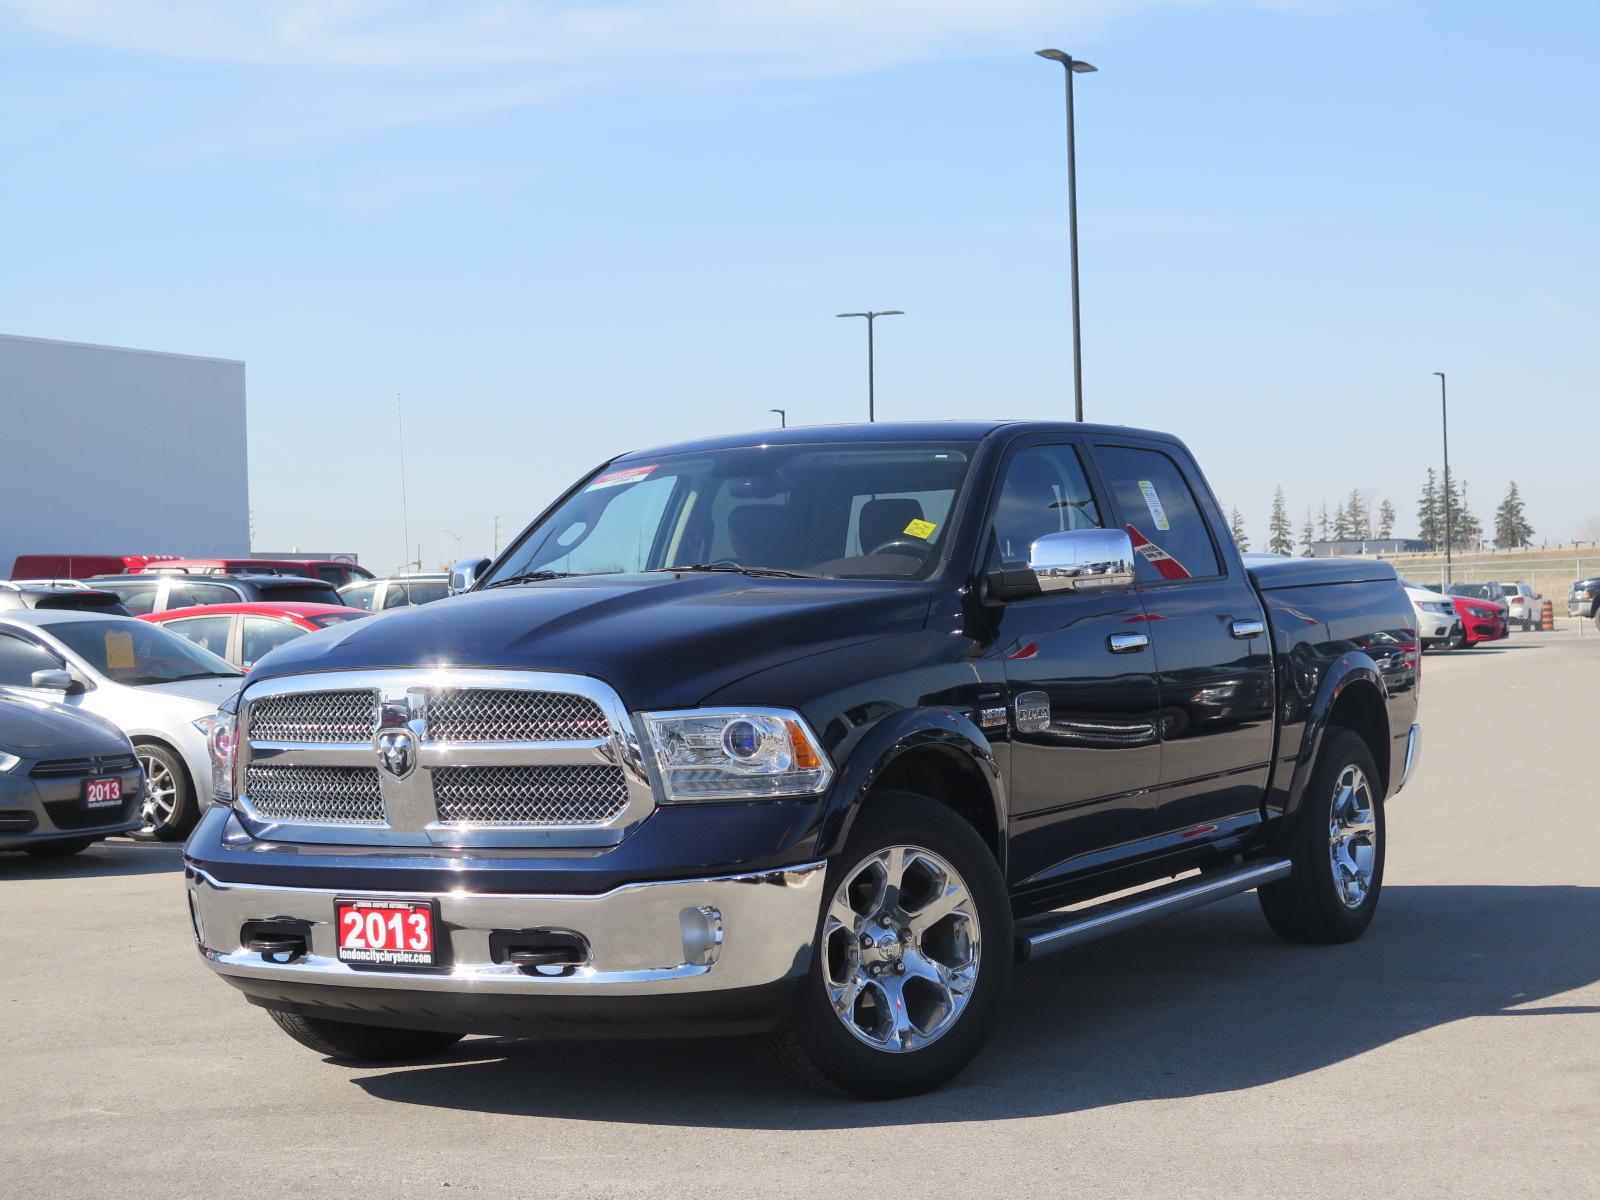 New 2013 Ram 1500, $36233